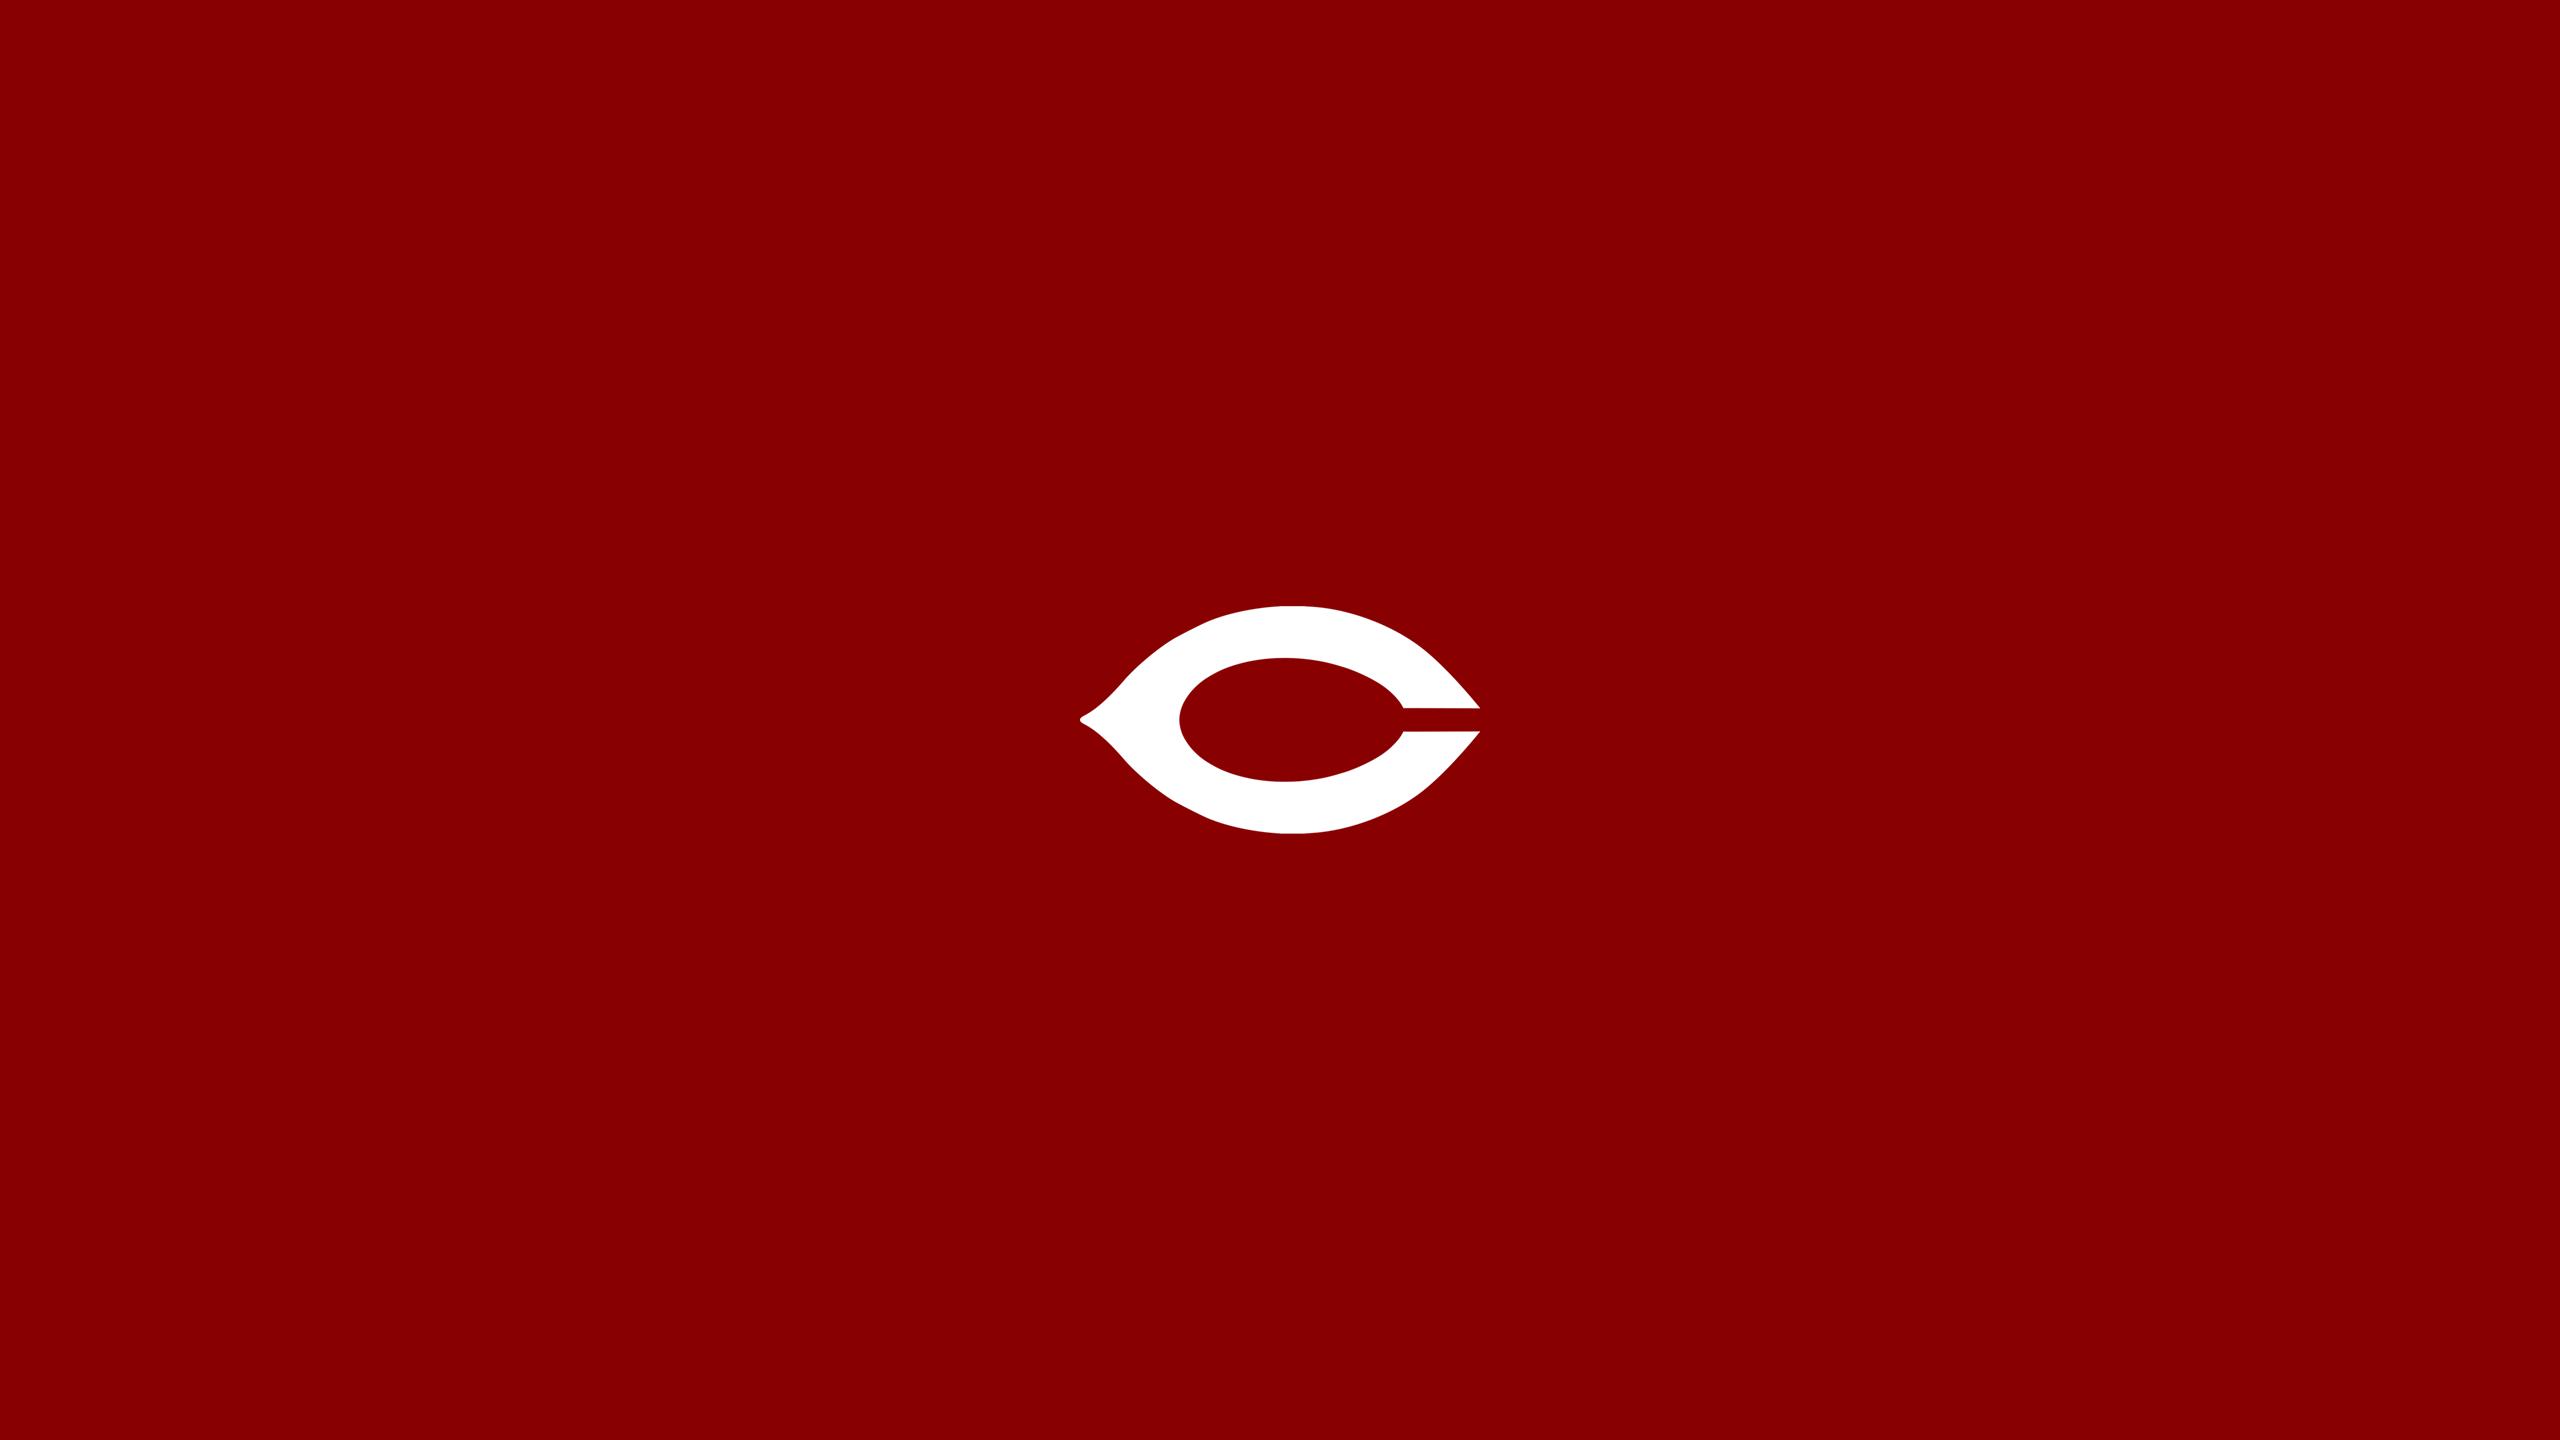 University of Chicago Maroons